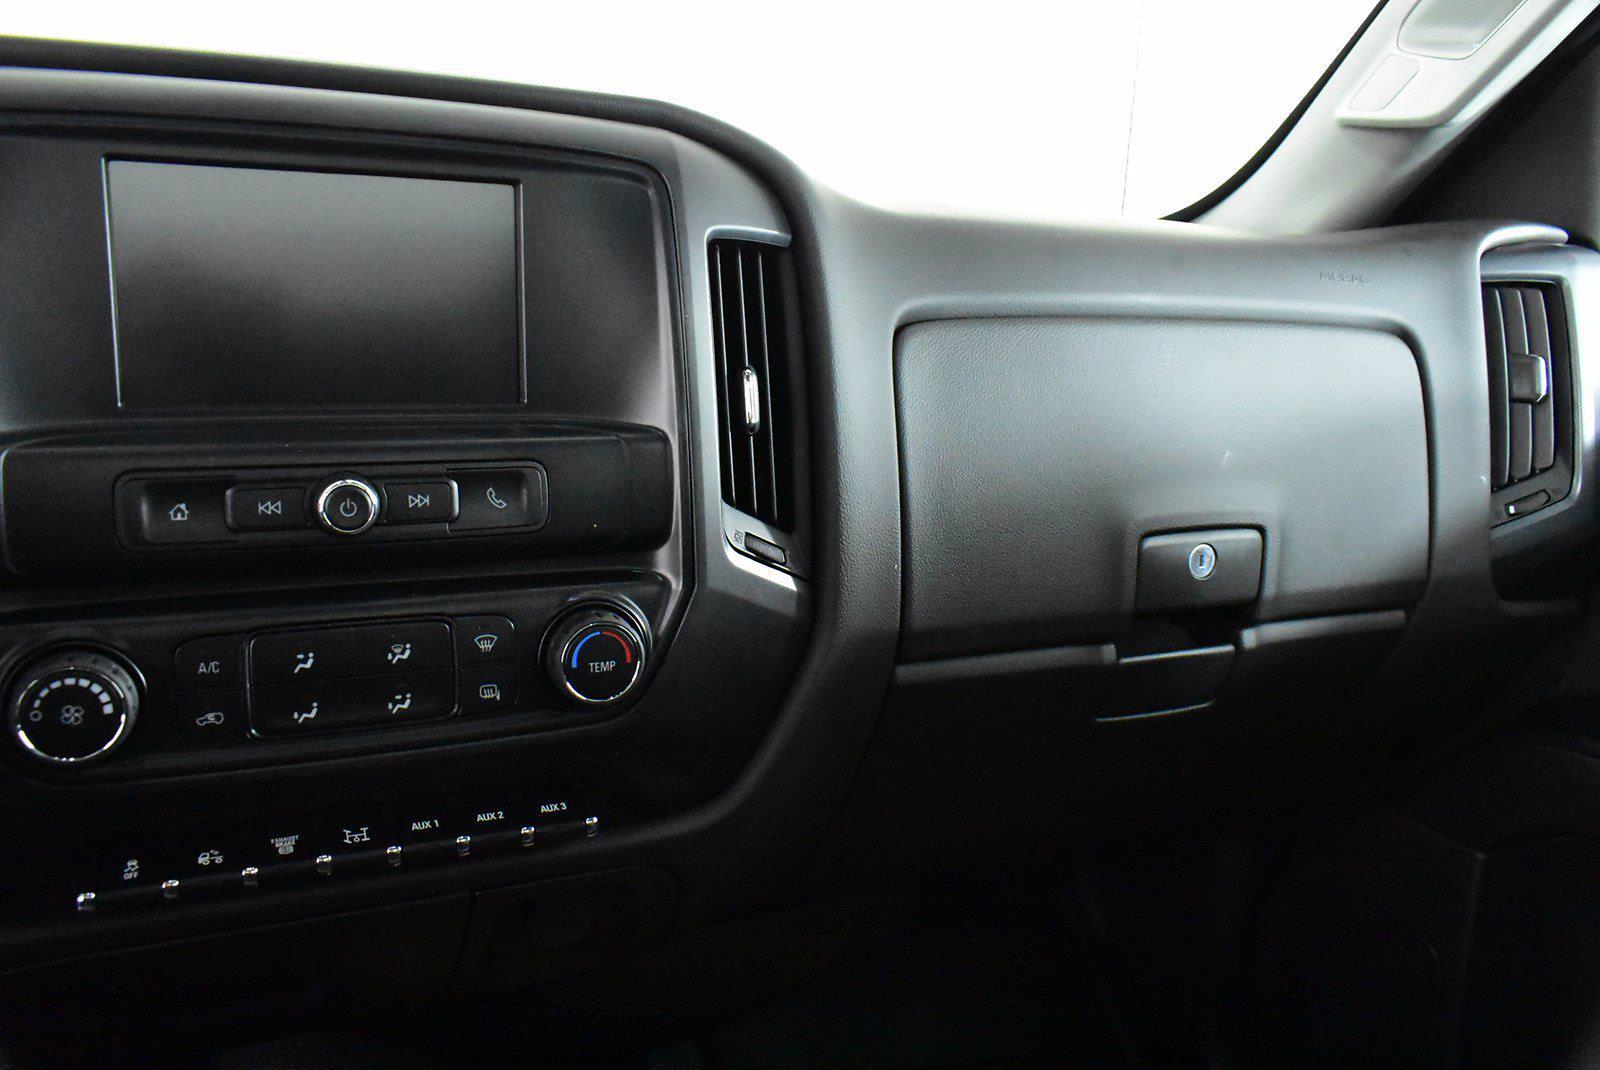 2020 Chevrolet Silverado 5500 DRW 4x2, Cab Chassis #D100223 - photo 6